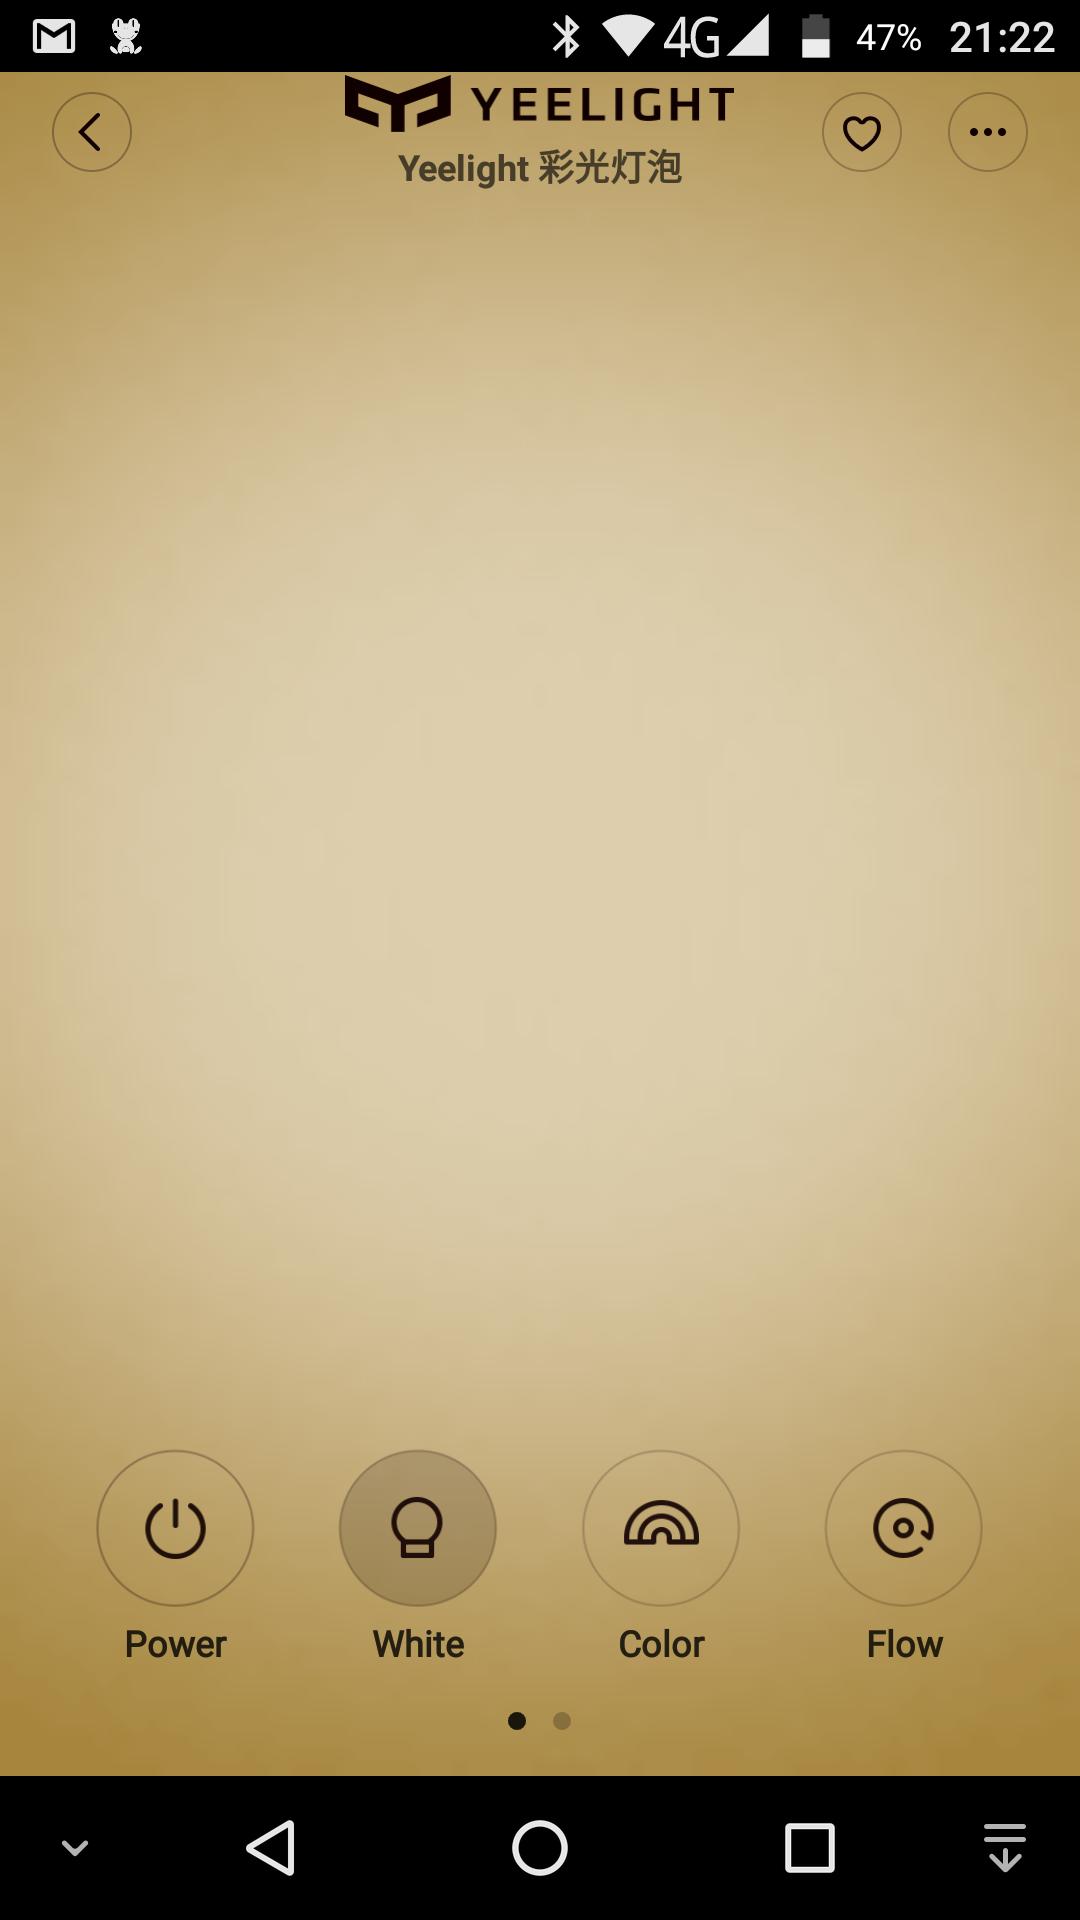 xiaomi_yeelight_menu_1.png